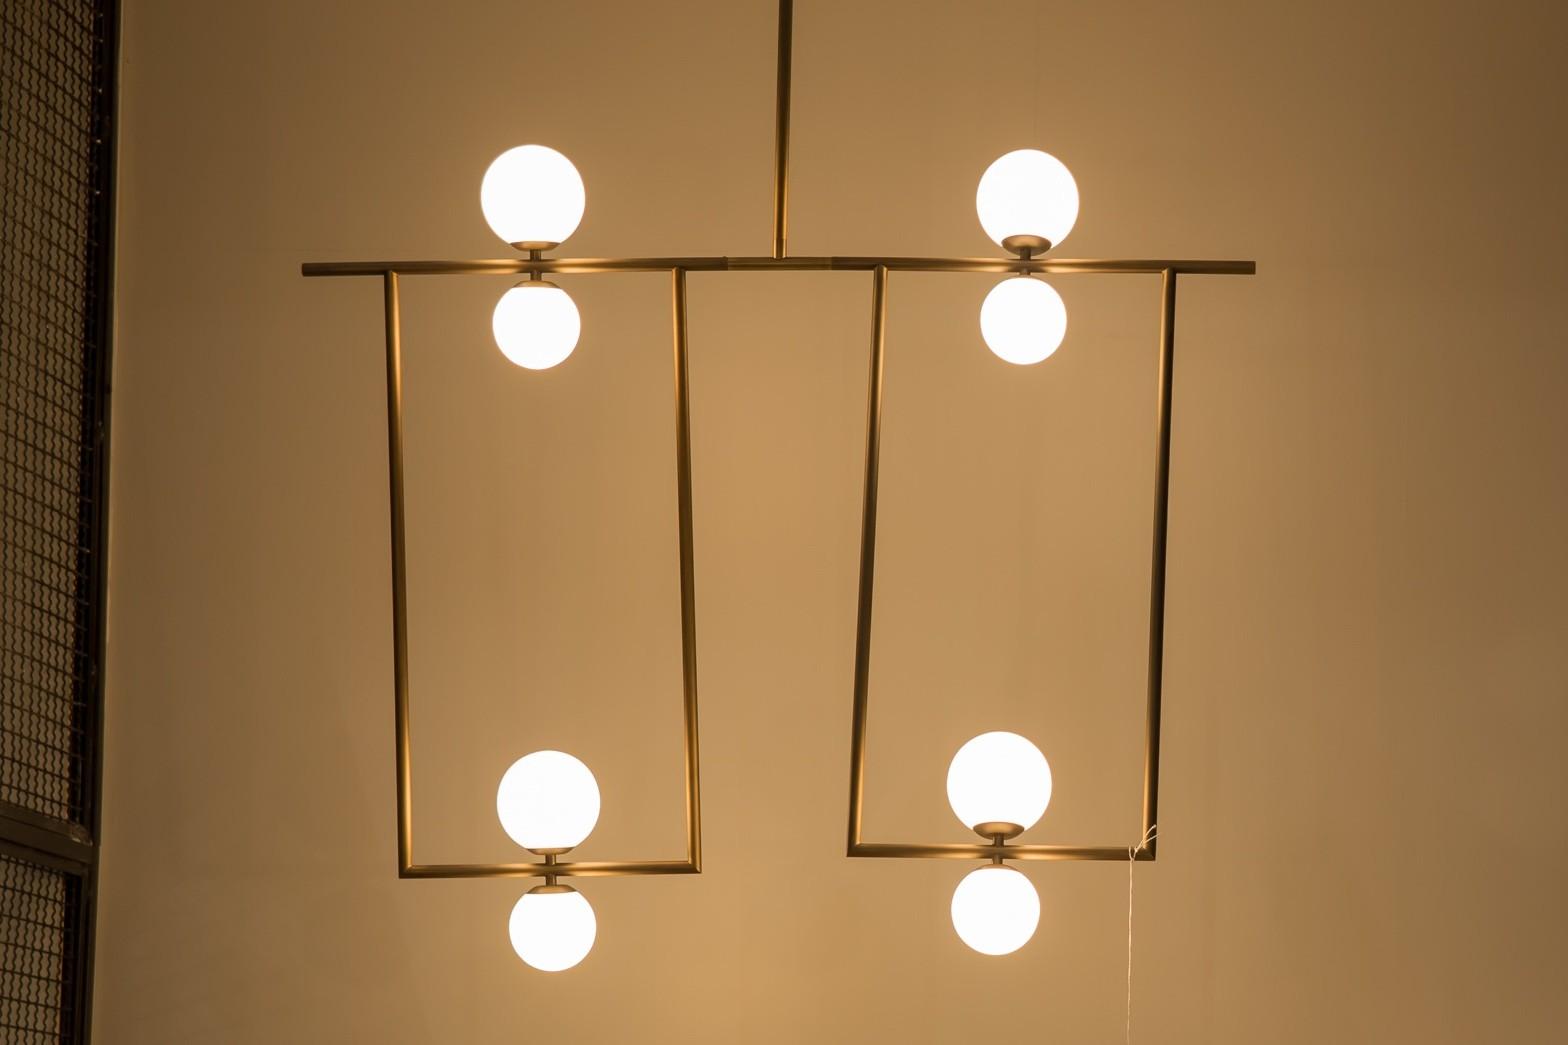 Pendente Balanço Sadalla Design 8 Lâmpada-GoldenArt